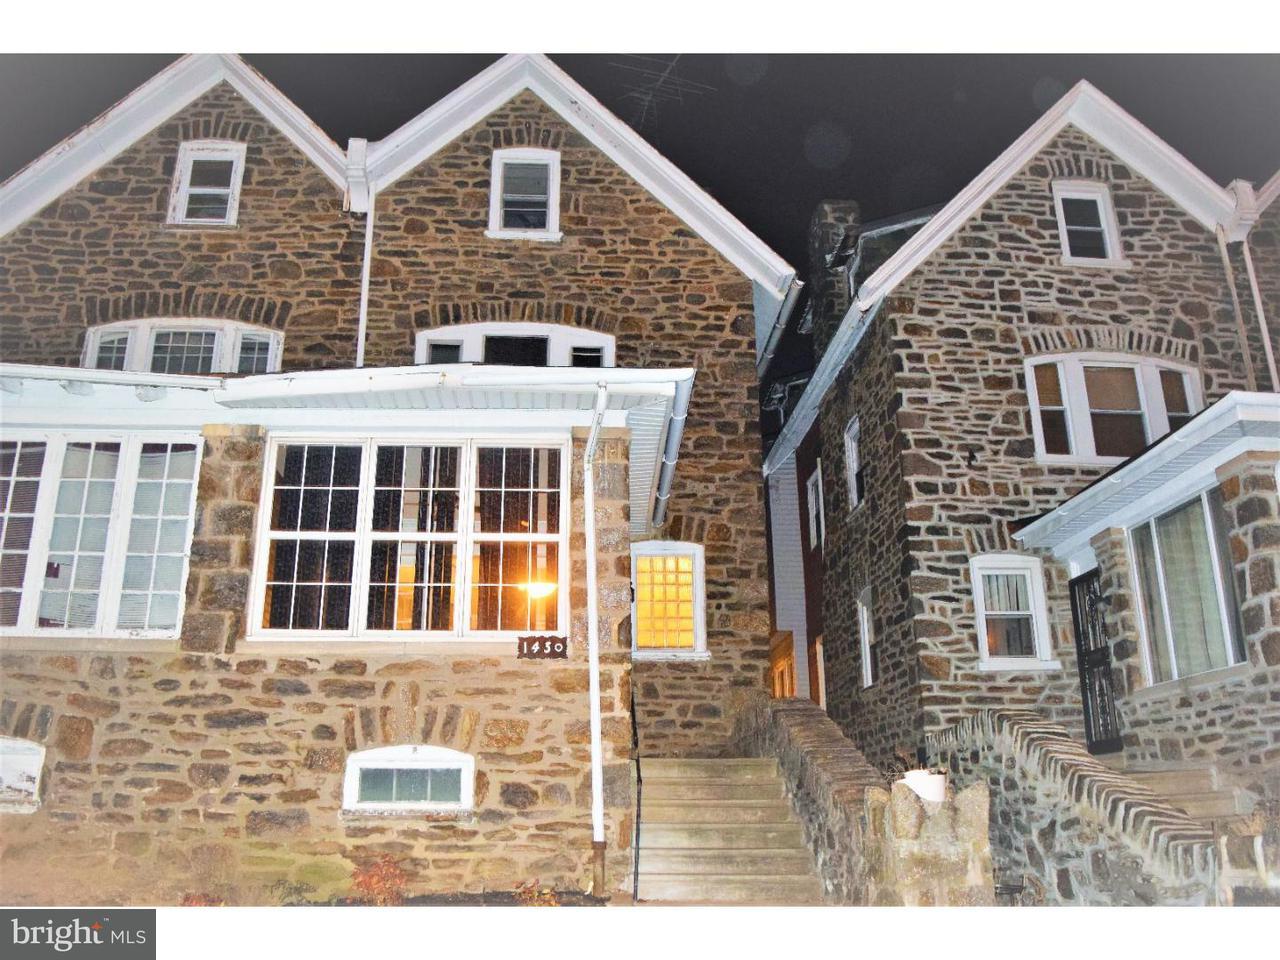 1430 W Somerville Philadelphia , PA 19141